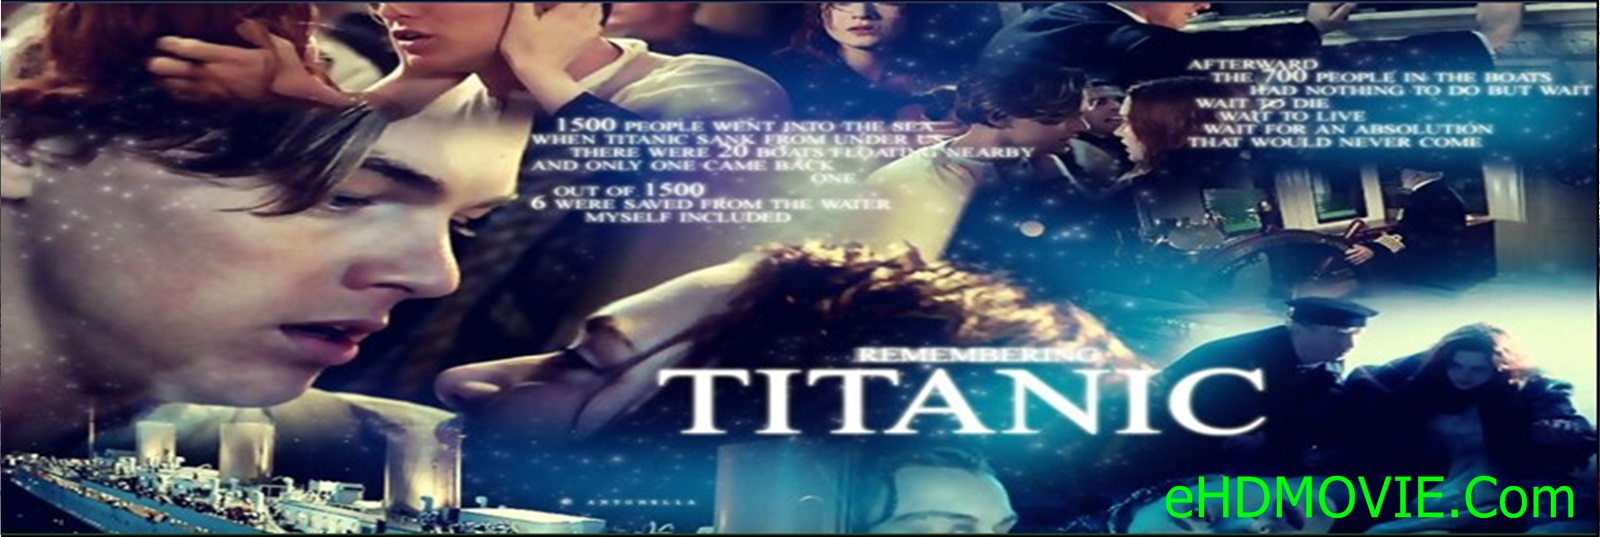 Titanic 1997 Full Movie Dual Audio [Hindi – English] 1080p - 720p - HEVC ORG BRRip 550MB - 2.3GB - 4.3GB ESubs Free Download